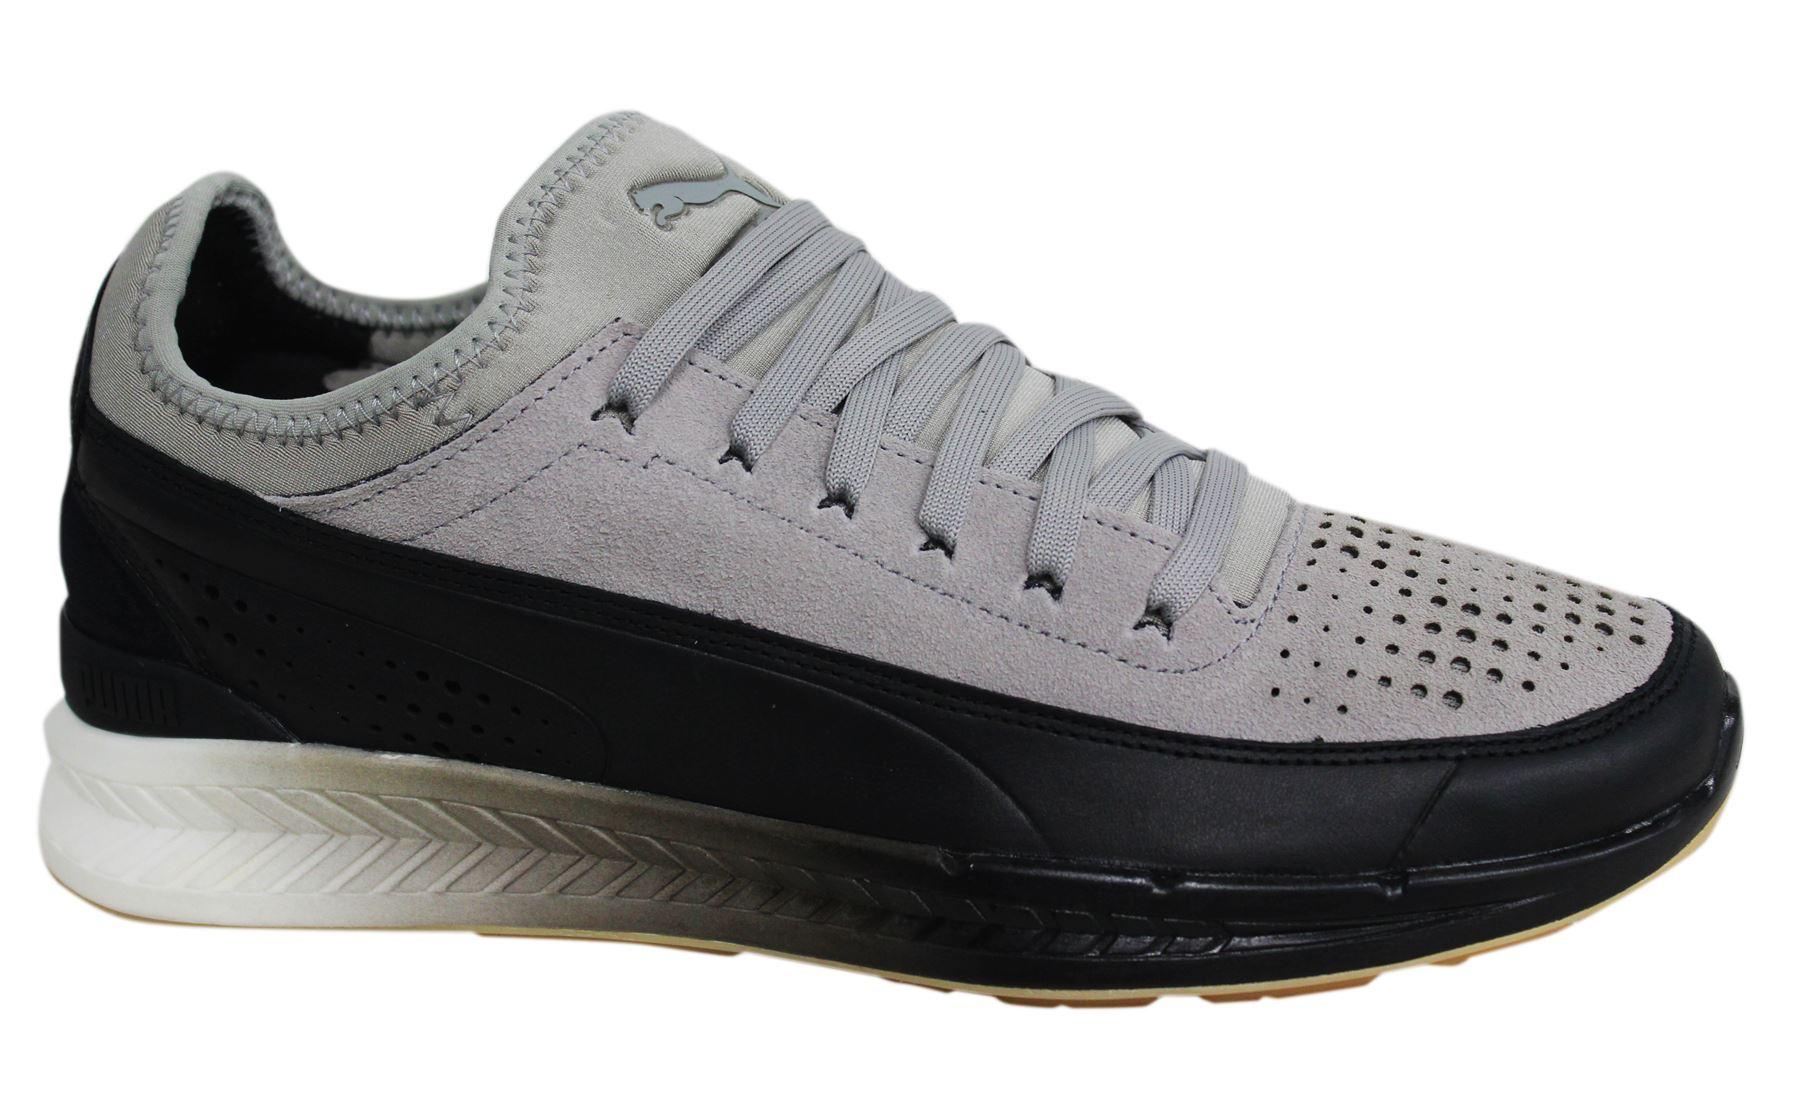 ebcdcc32634 Puma Ignite Sock Select con lacci grigio nere da Uomo Scarpe Ginnastica  360100. 364092 02 Scarpe Puma Basket Platform ...